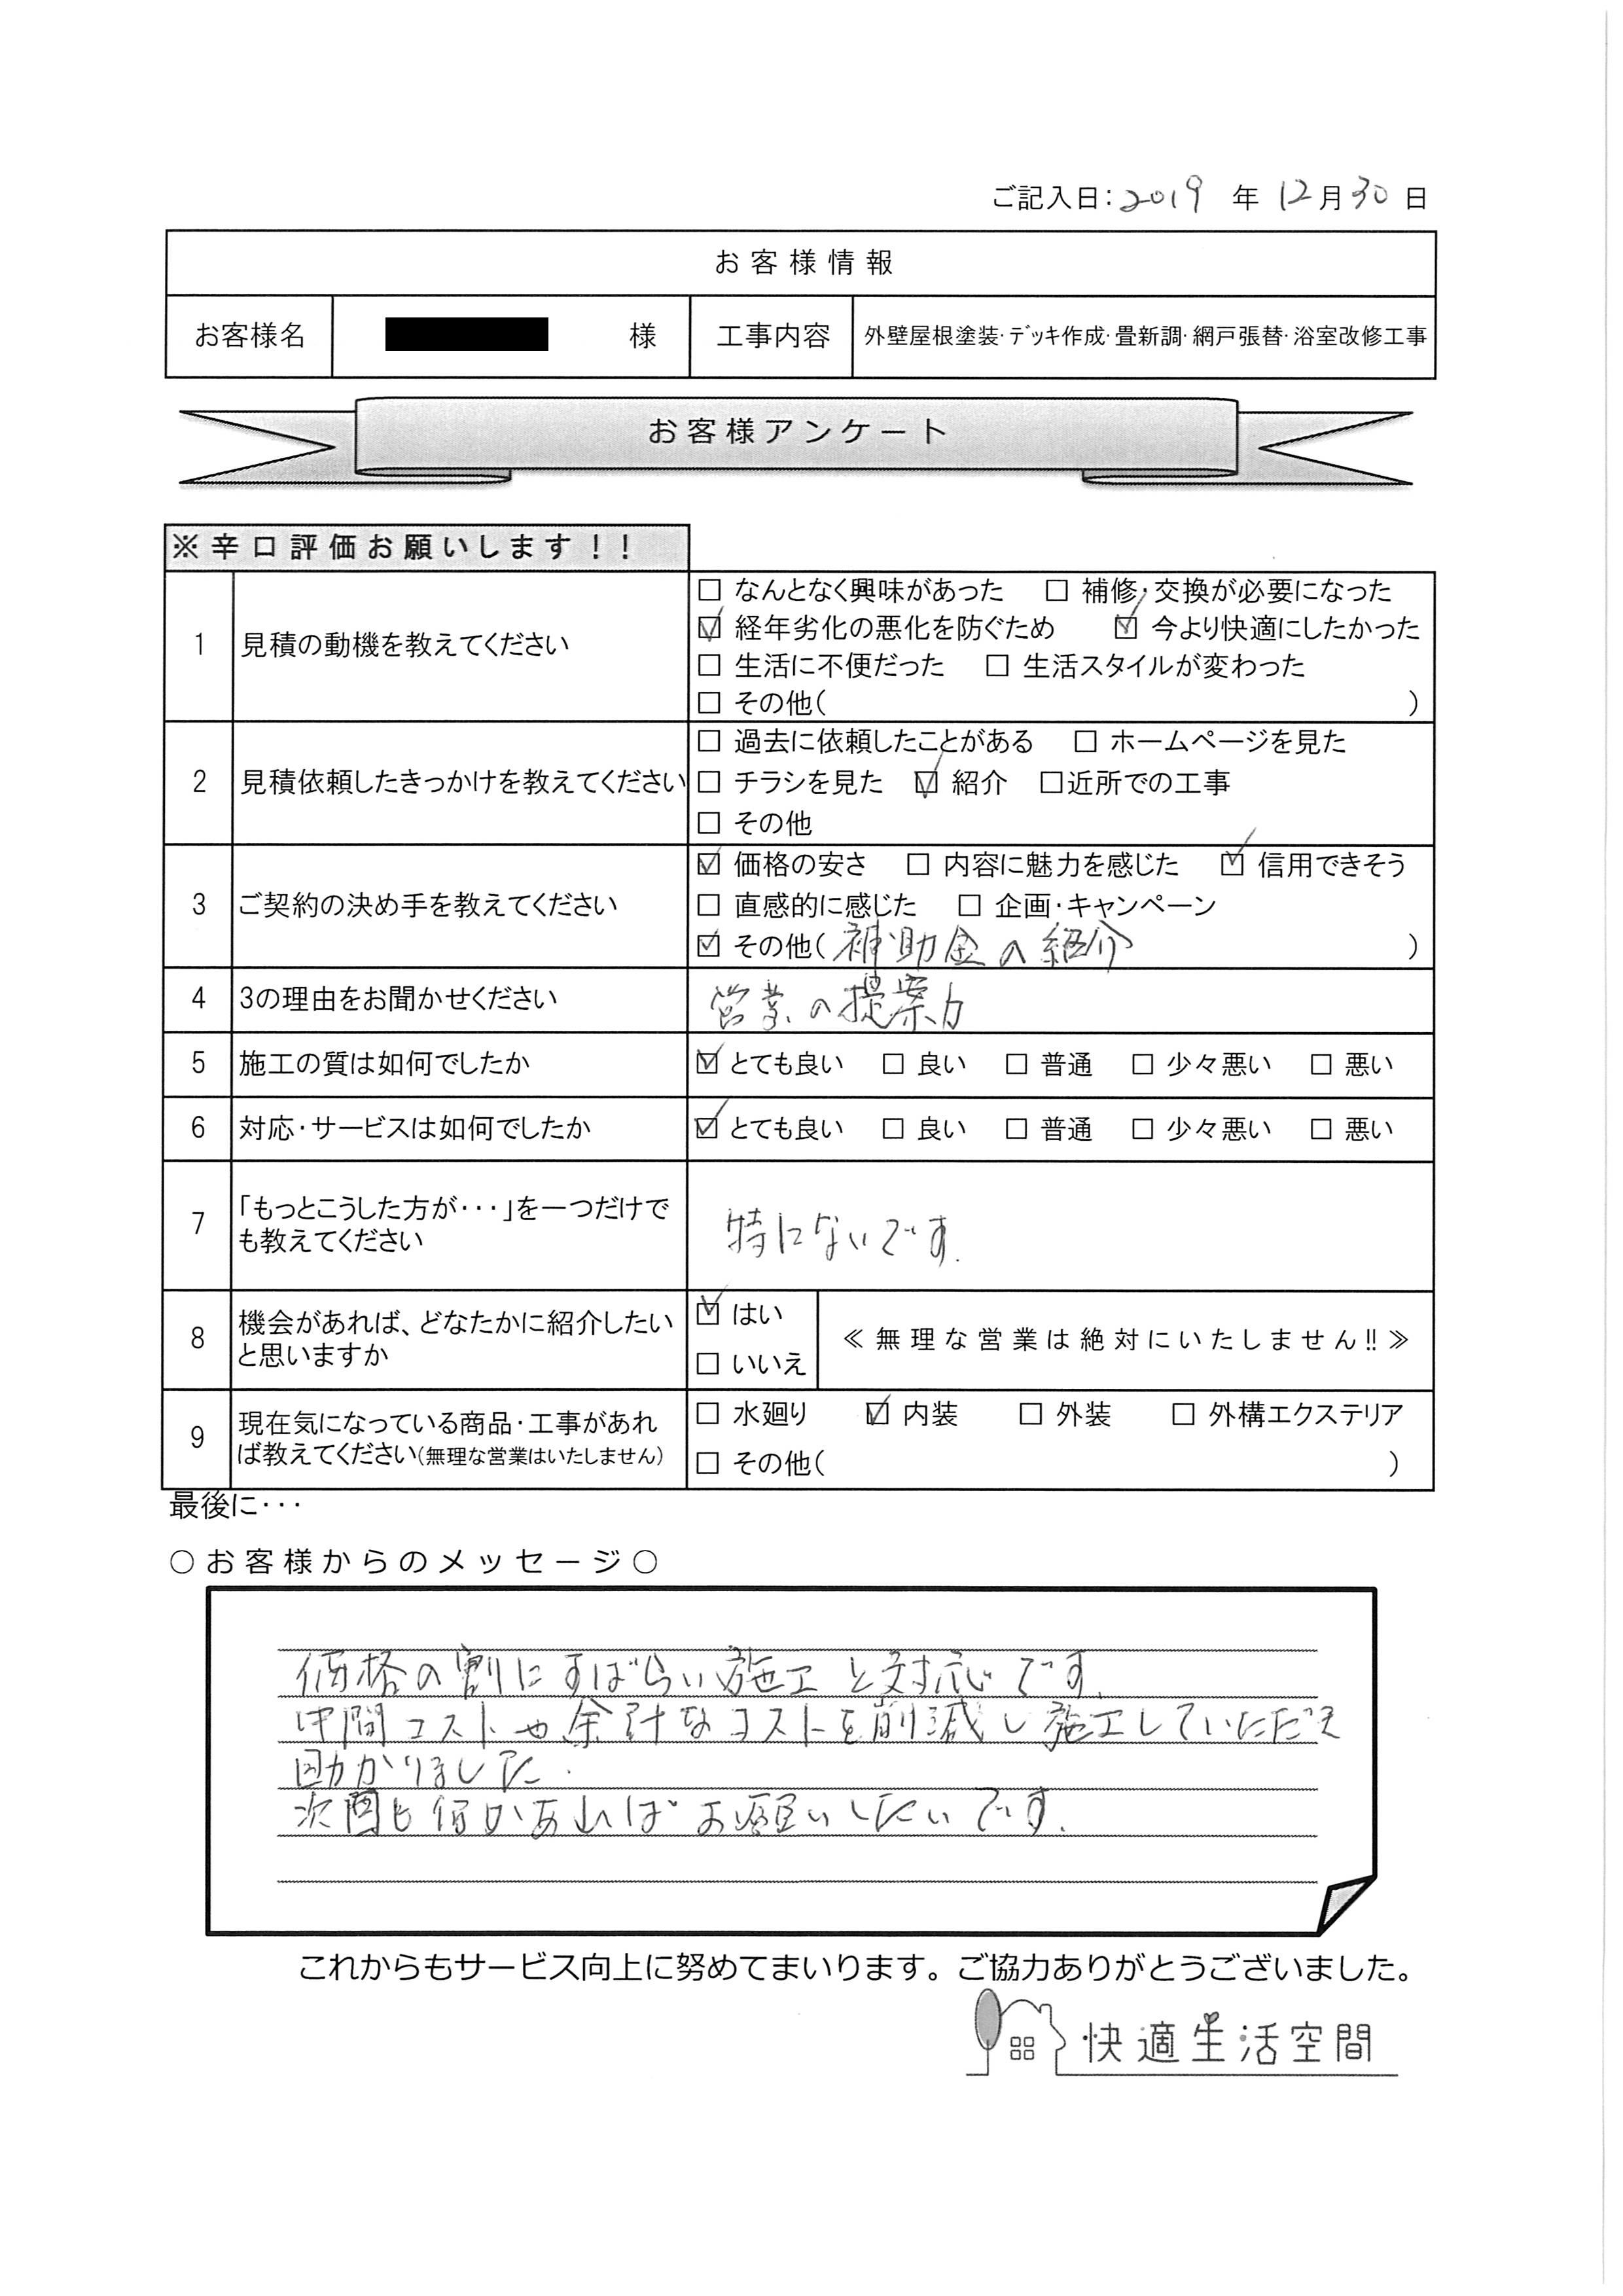 H様邸 総合リフォーム工事アンケート